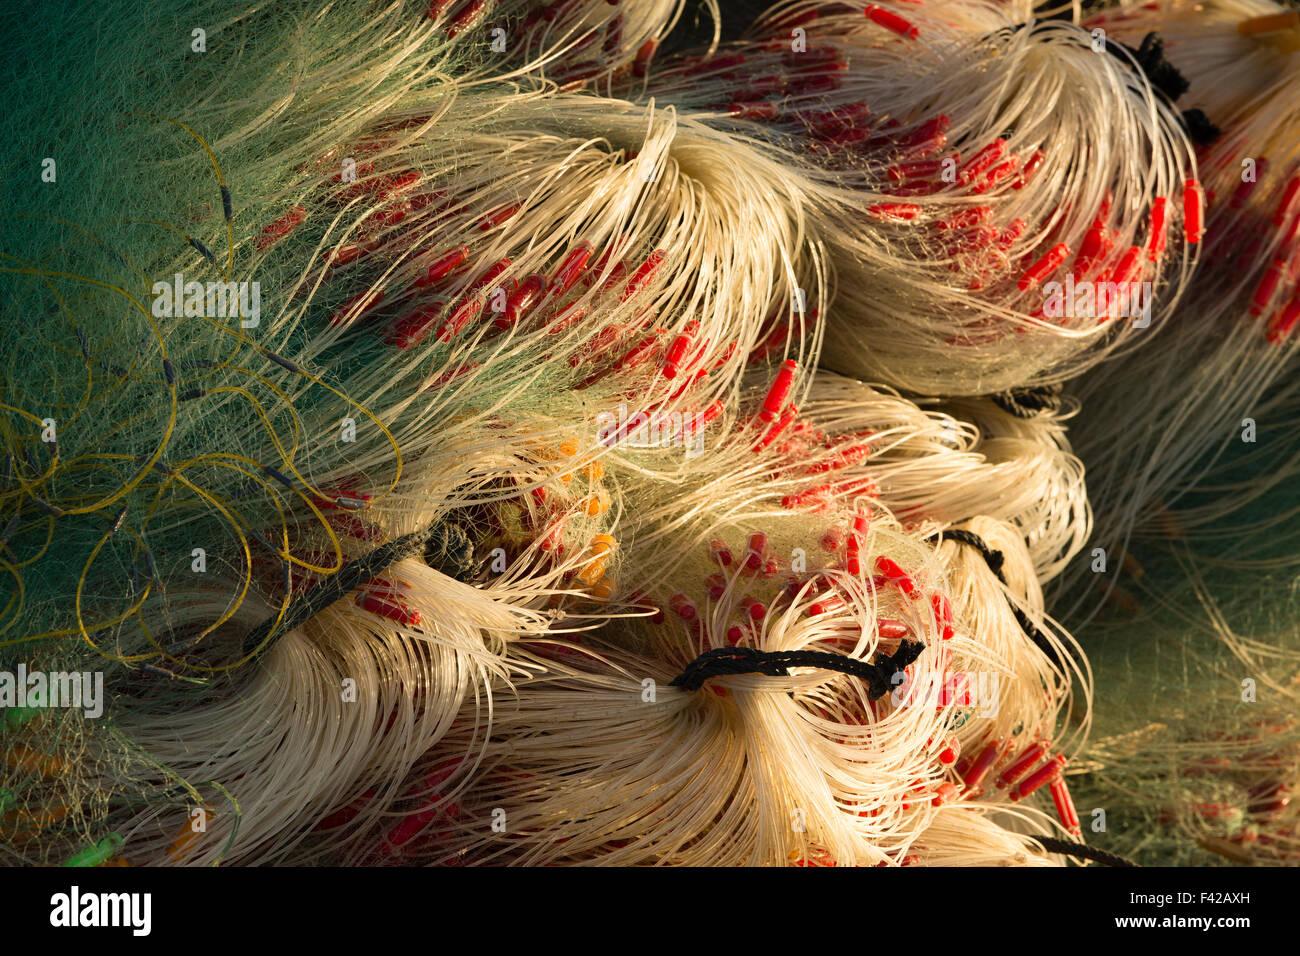 mending the nets, Mũi Né fishing village, Bình Thuận Province, Vietnam - Stock Image